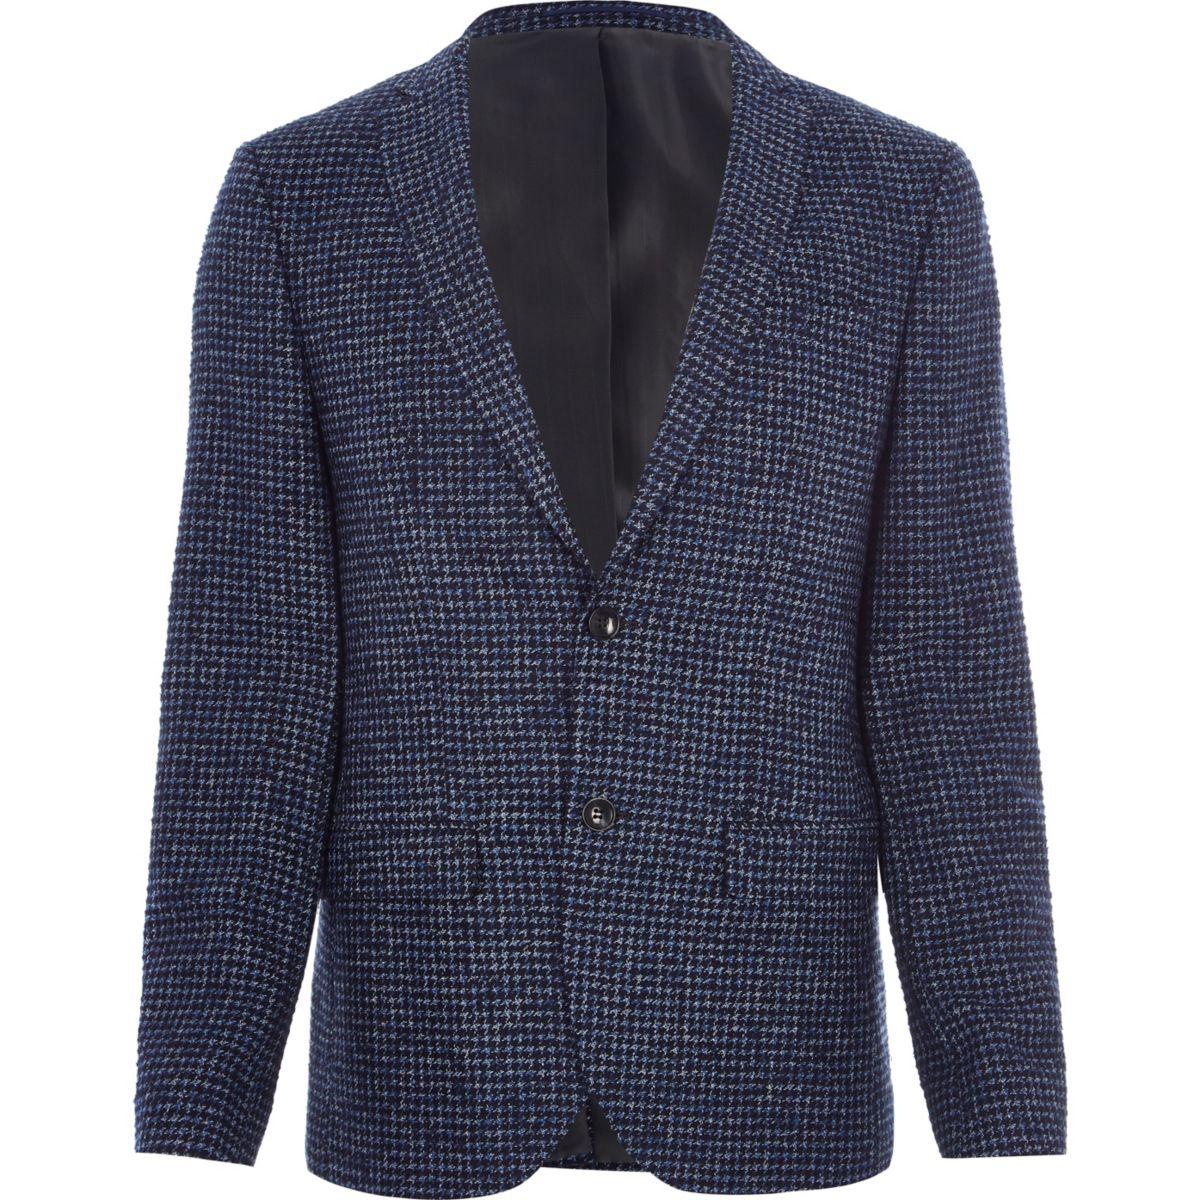 Blauwe skinny-fit blazer met pied-de-poule-motief